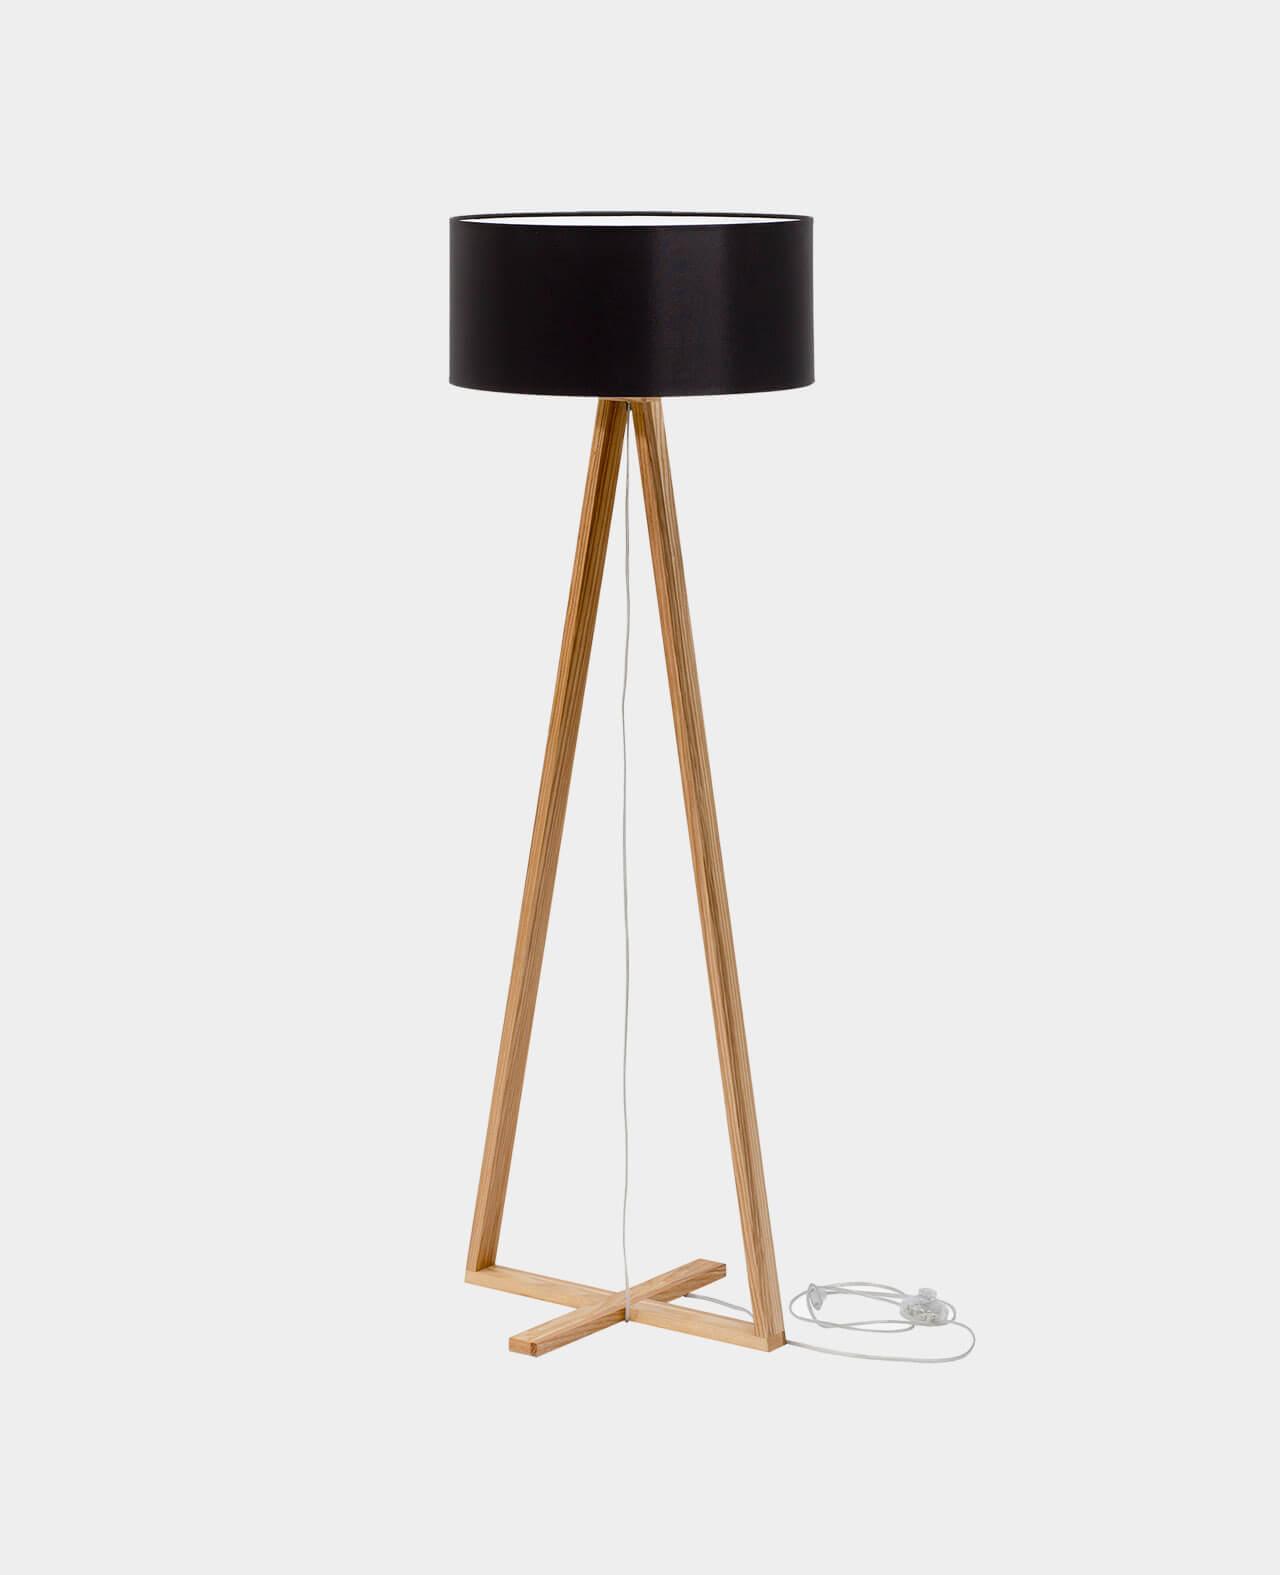 Entdecke Jetzt Die Design Stehlampe Tales Black Satamo De